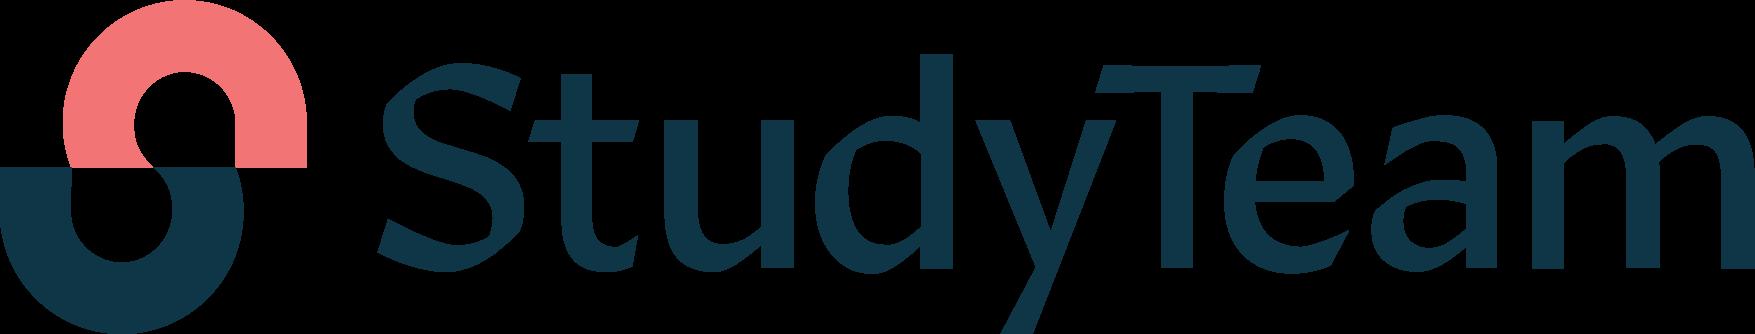 studyteam-standard-logo-full-color-rgb